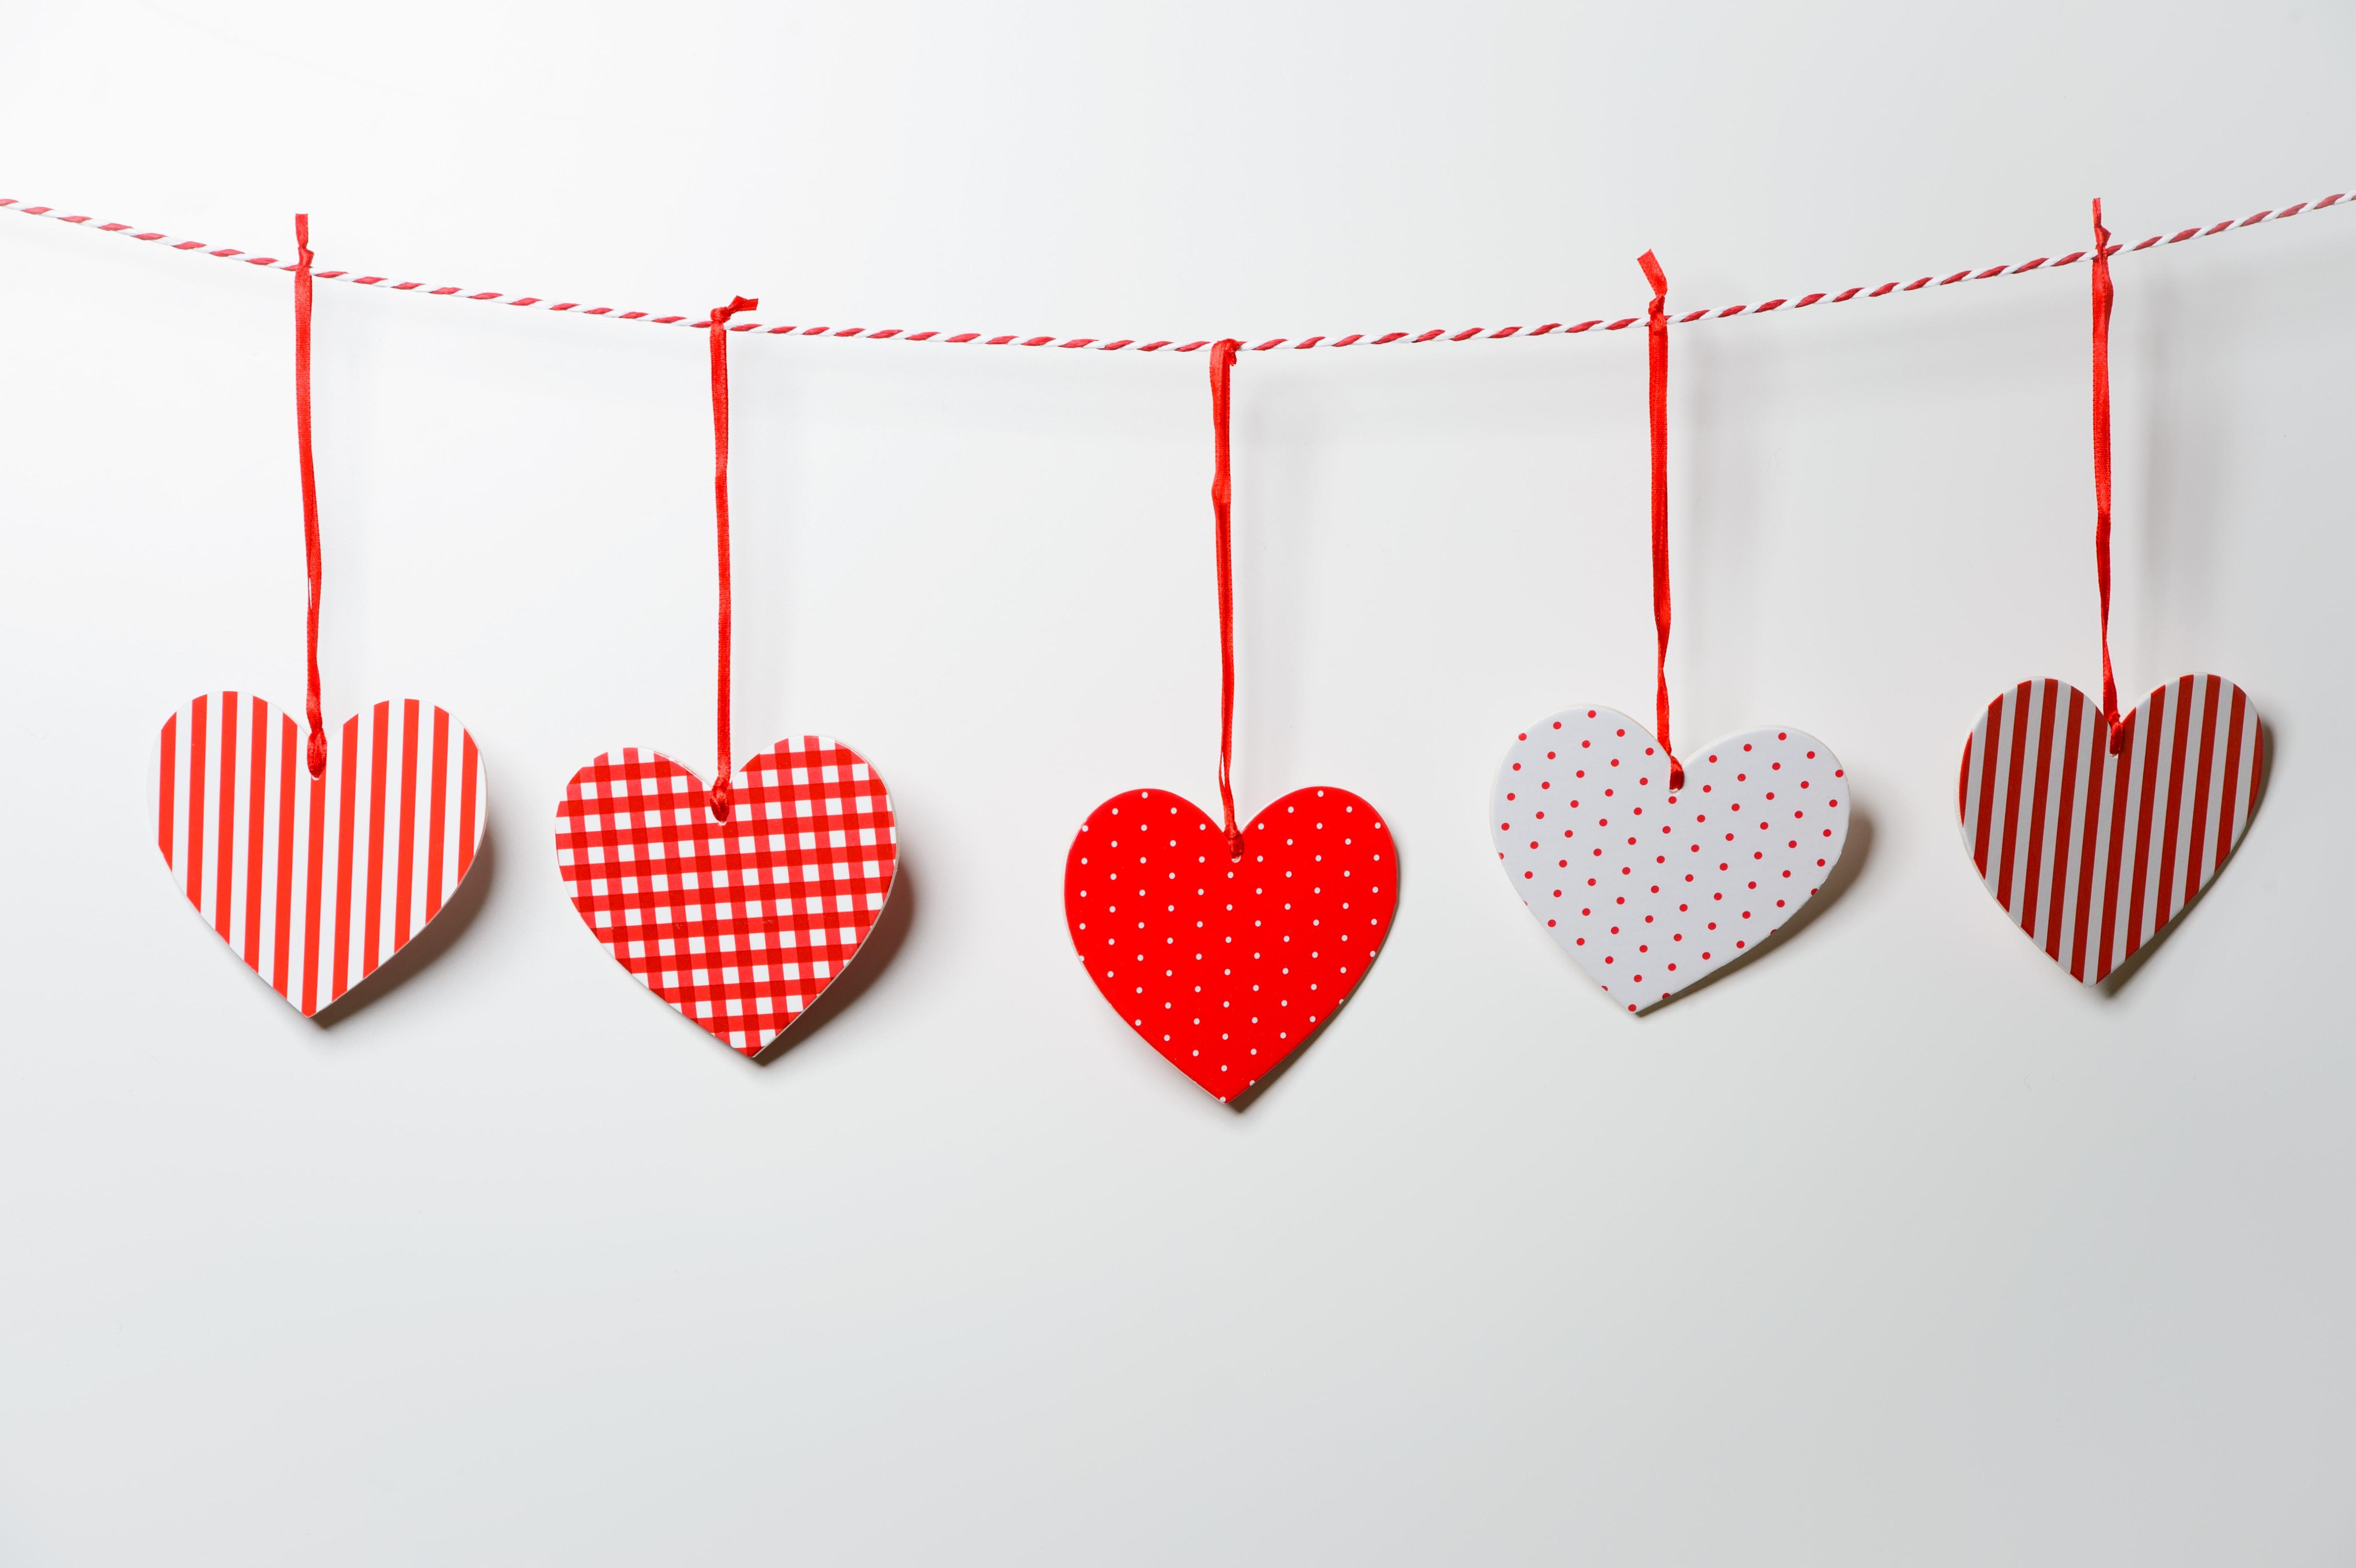 Favorite Office Day Decor Ideas Custom Home Group Valentines Day Decorations Office Valentine S Day Decoration Ideas Subtle curbed Valentines Day Decor